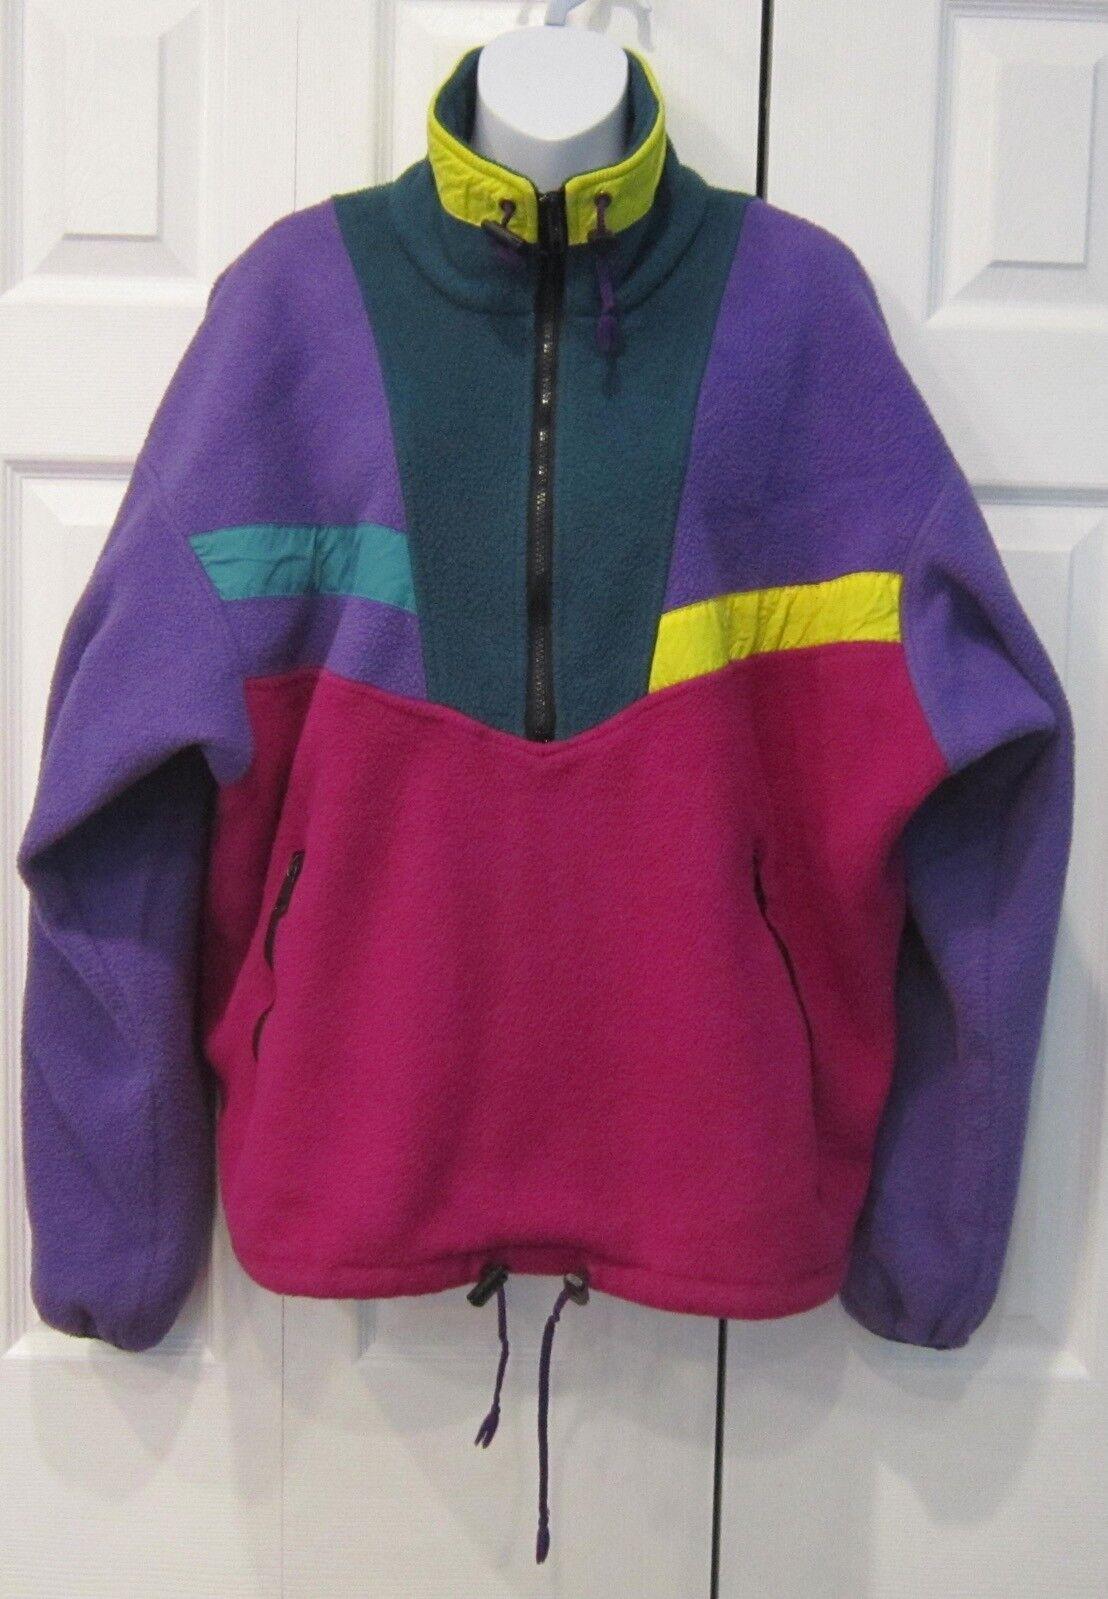 Vintage 90s Bright Colour Block PolarLite Vau De Malden Sweatshirt Pullover M